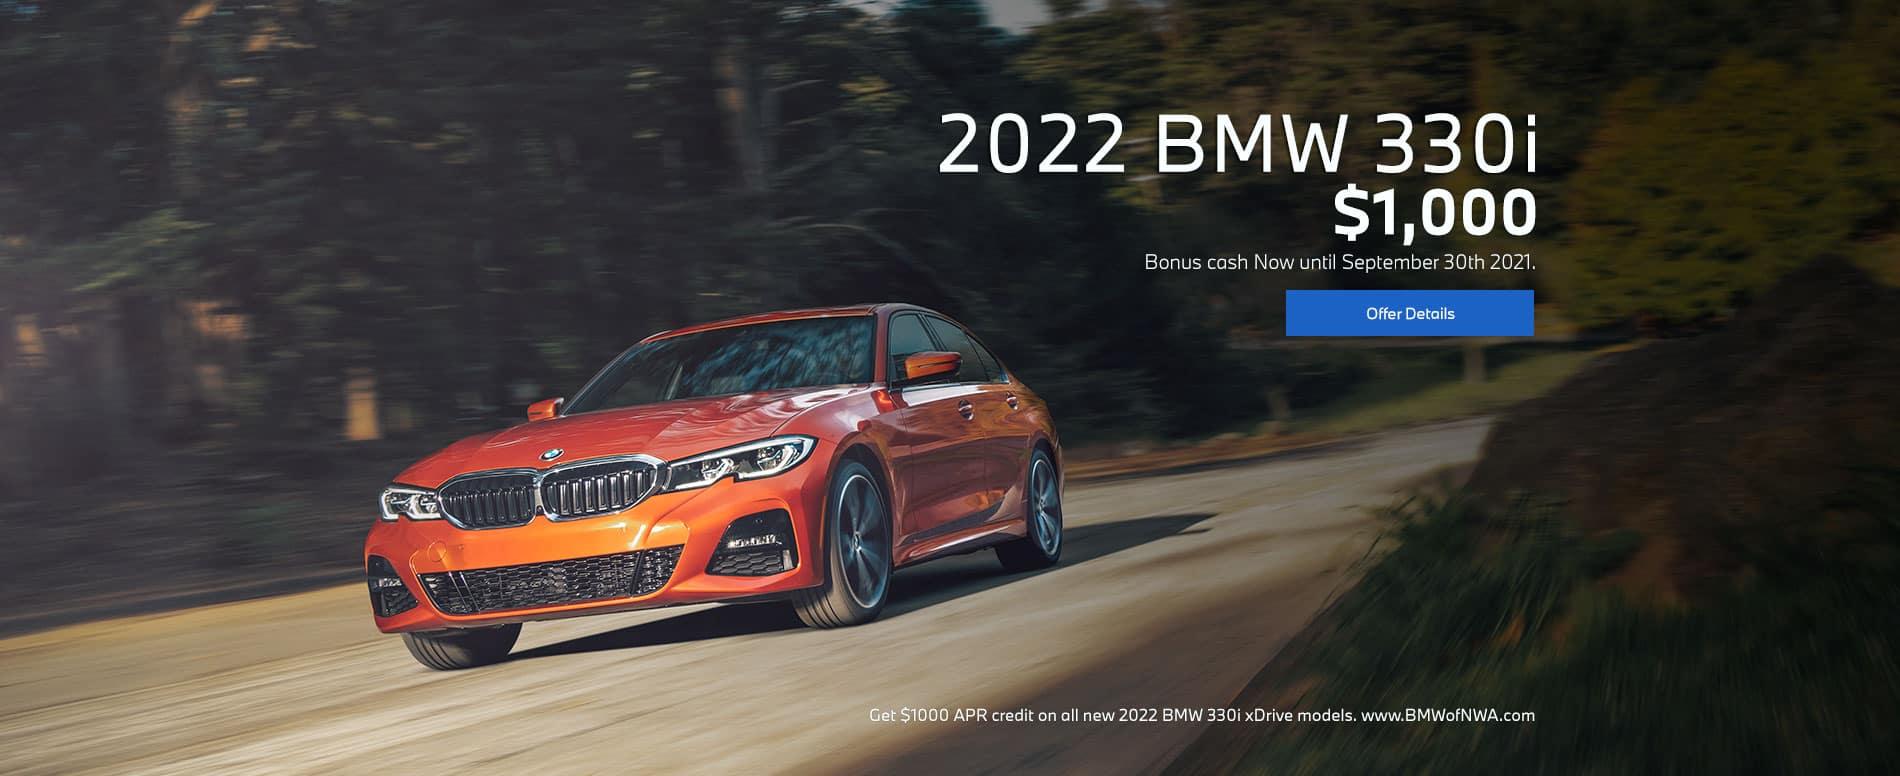 2022 BMW 330i $1000 bonus cash on sedan models